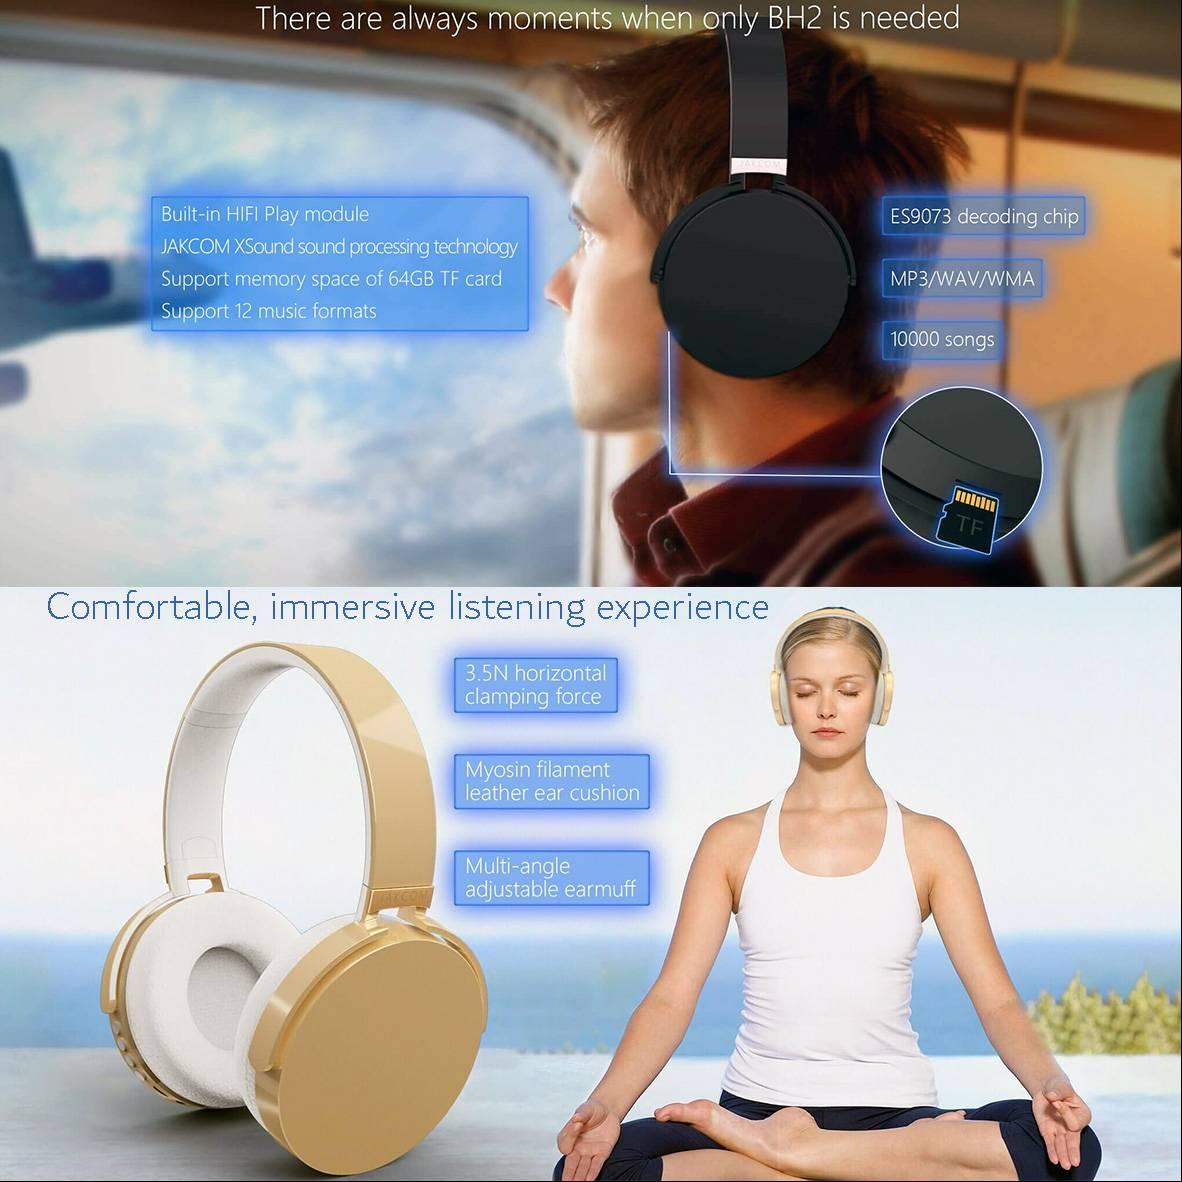 Jakcom Bh2 Smart Bluetooth Headset Wireless Stereo Headphones Earphones With Mic1